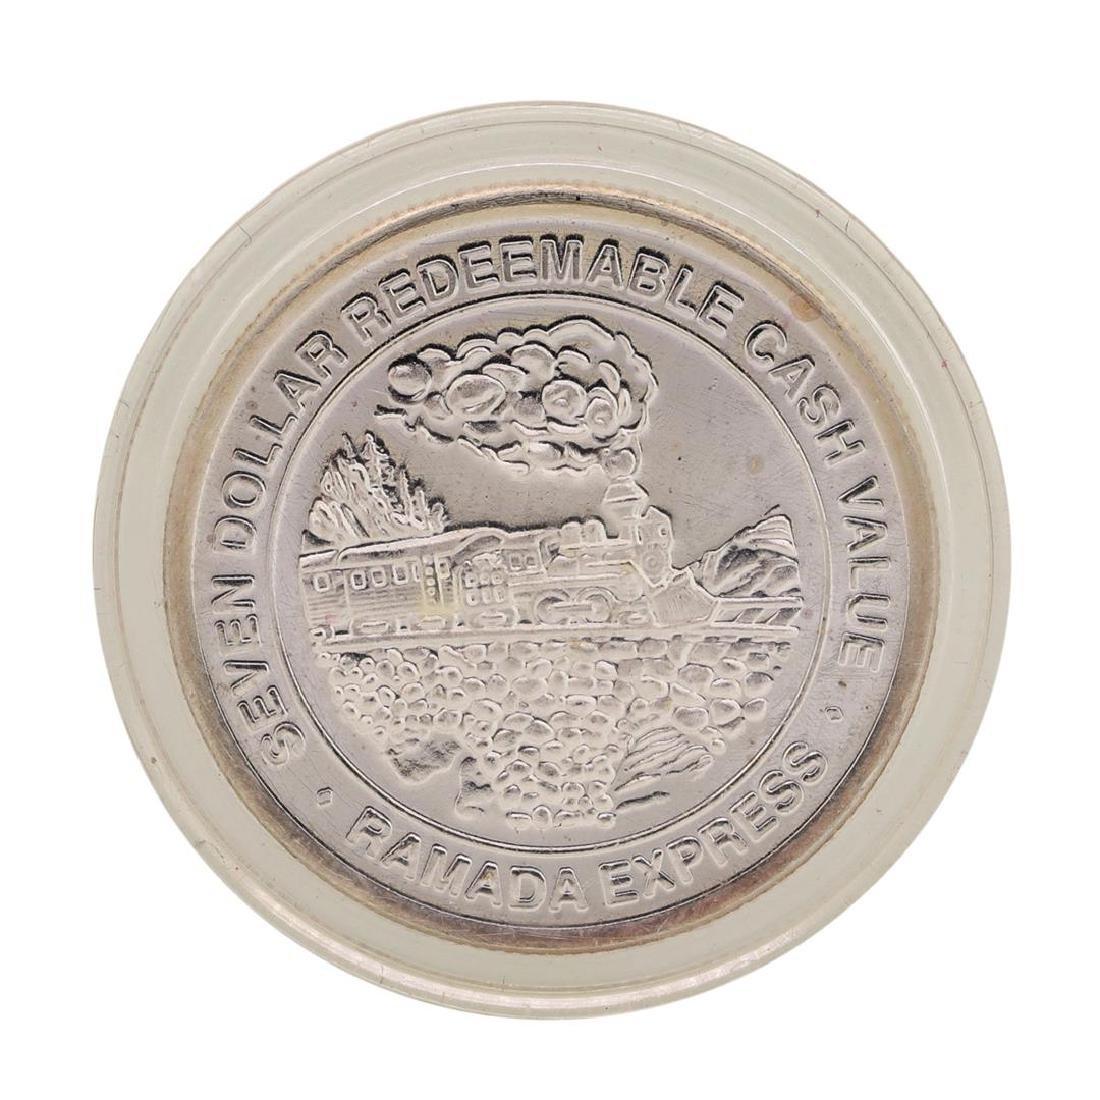 .999 Silver Ramada Express Laughlin, NV $7 Redeemable - 2